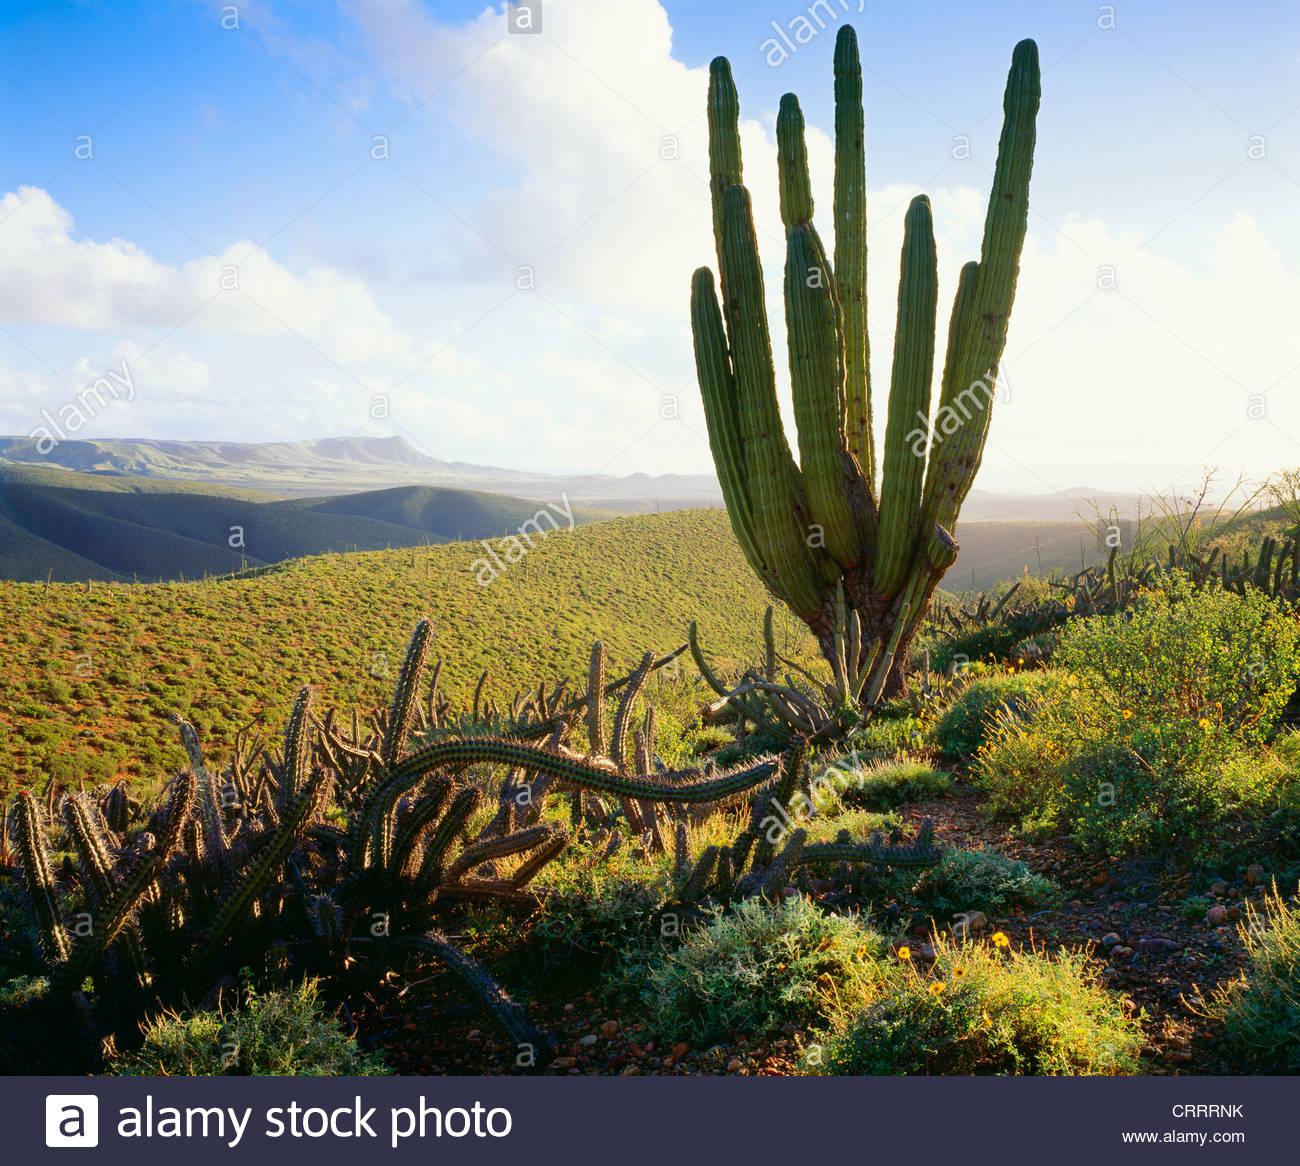 Cardon cactus, Baja California, Mexico. - Stock Image